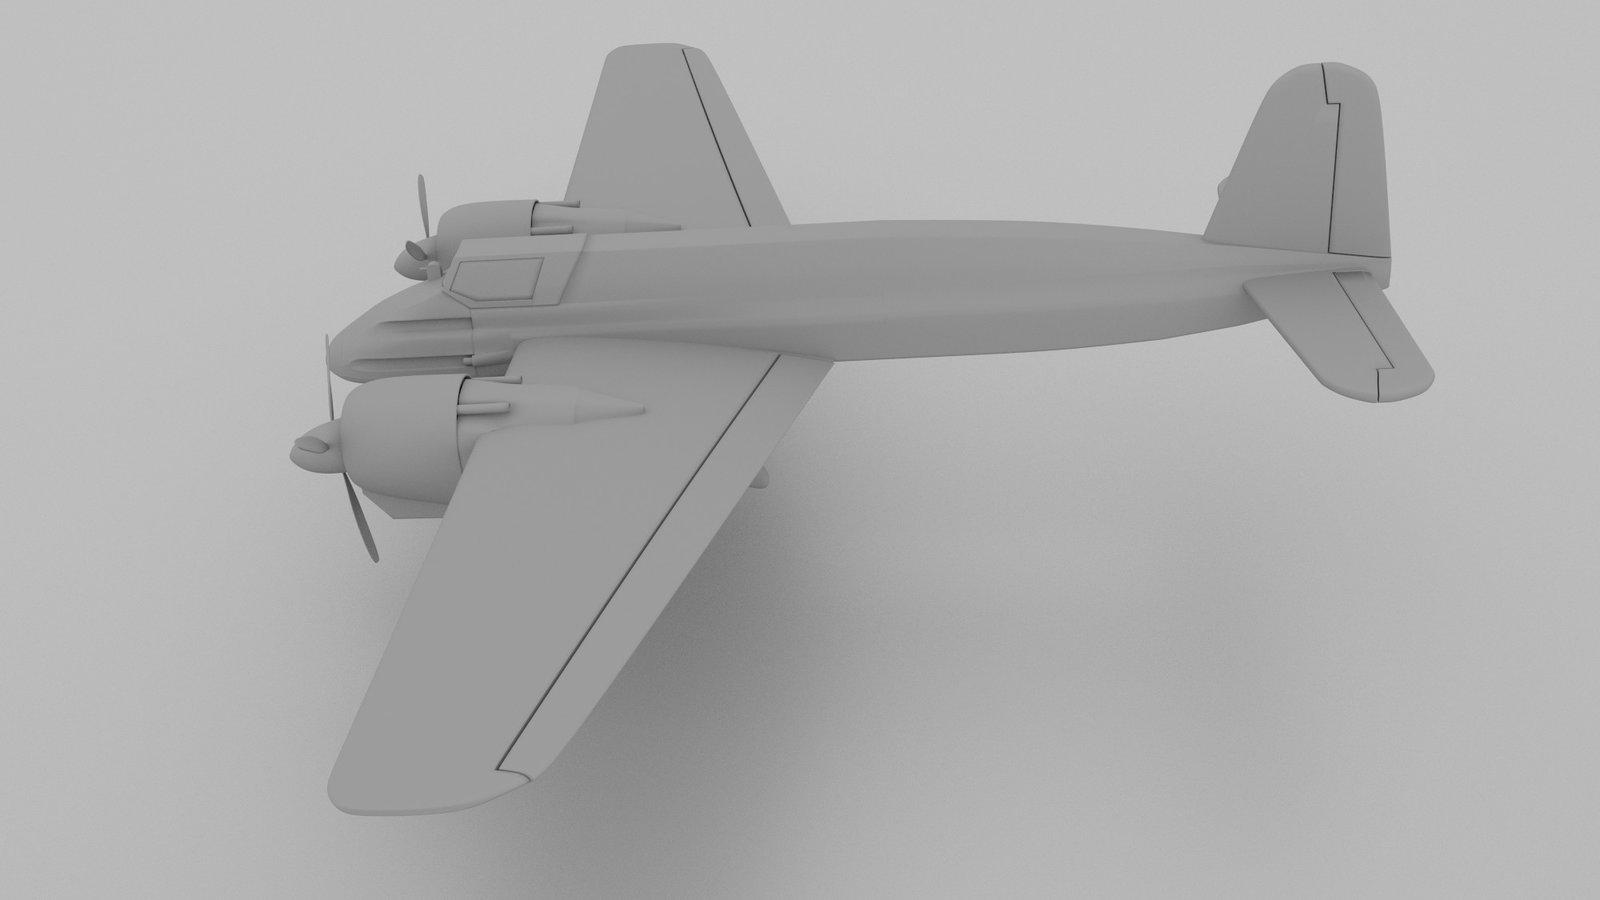 plane_side.jpg